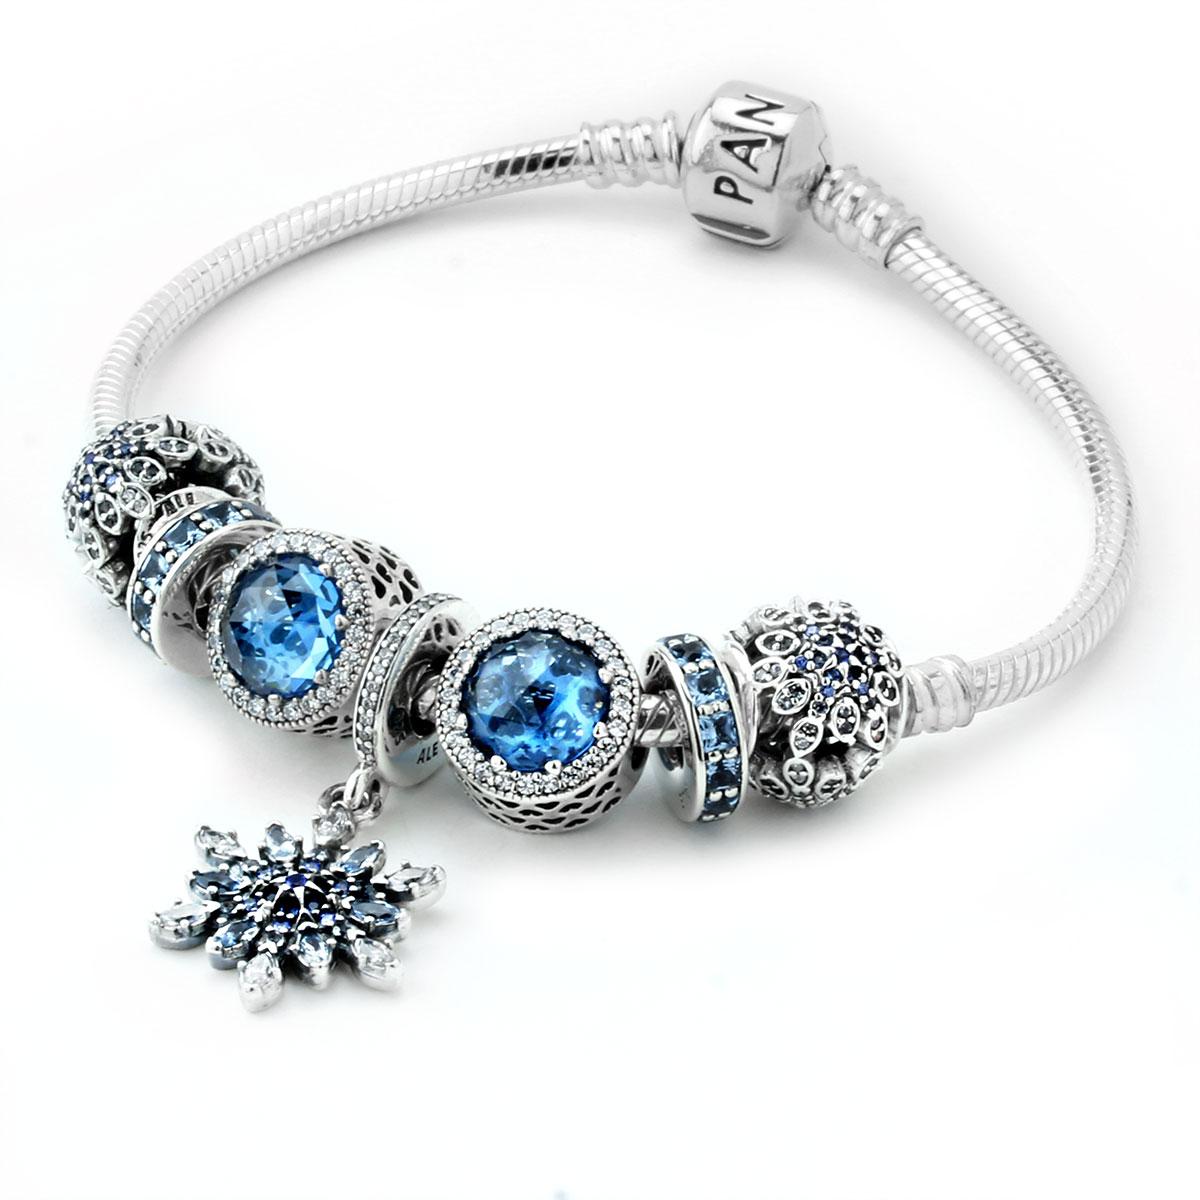 Pandora Bracelet Design Ideas pandora bracelets design ideas Pandora Designer Bracelets Elisa Ilana